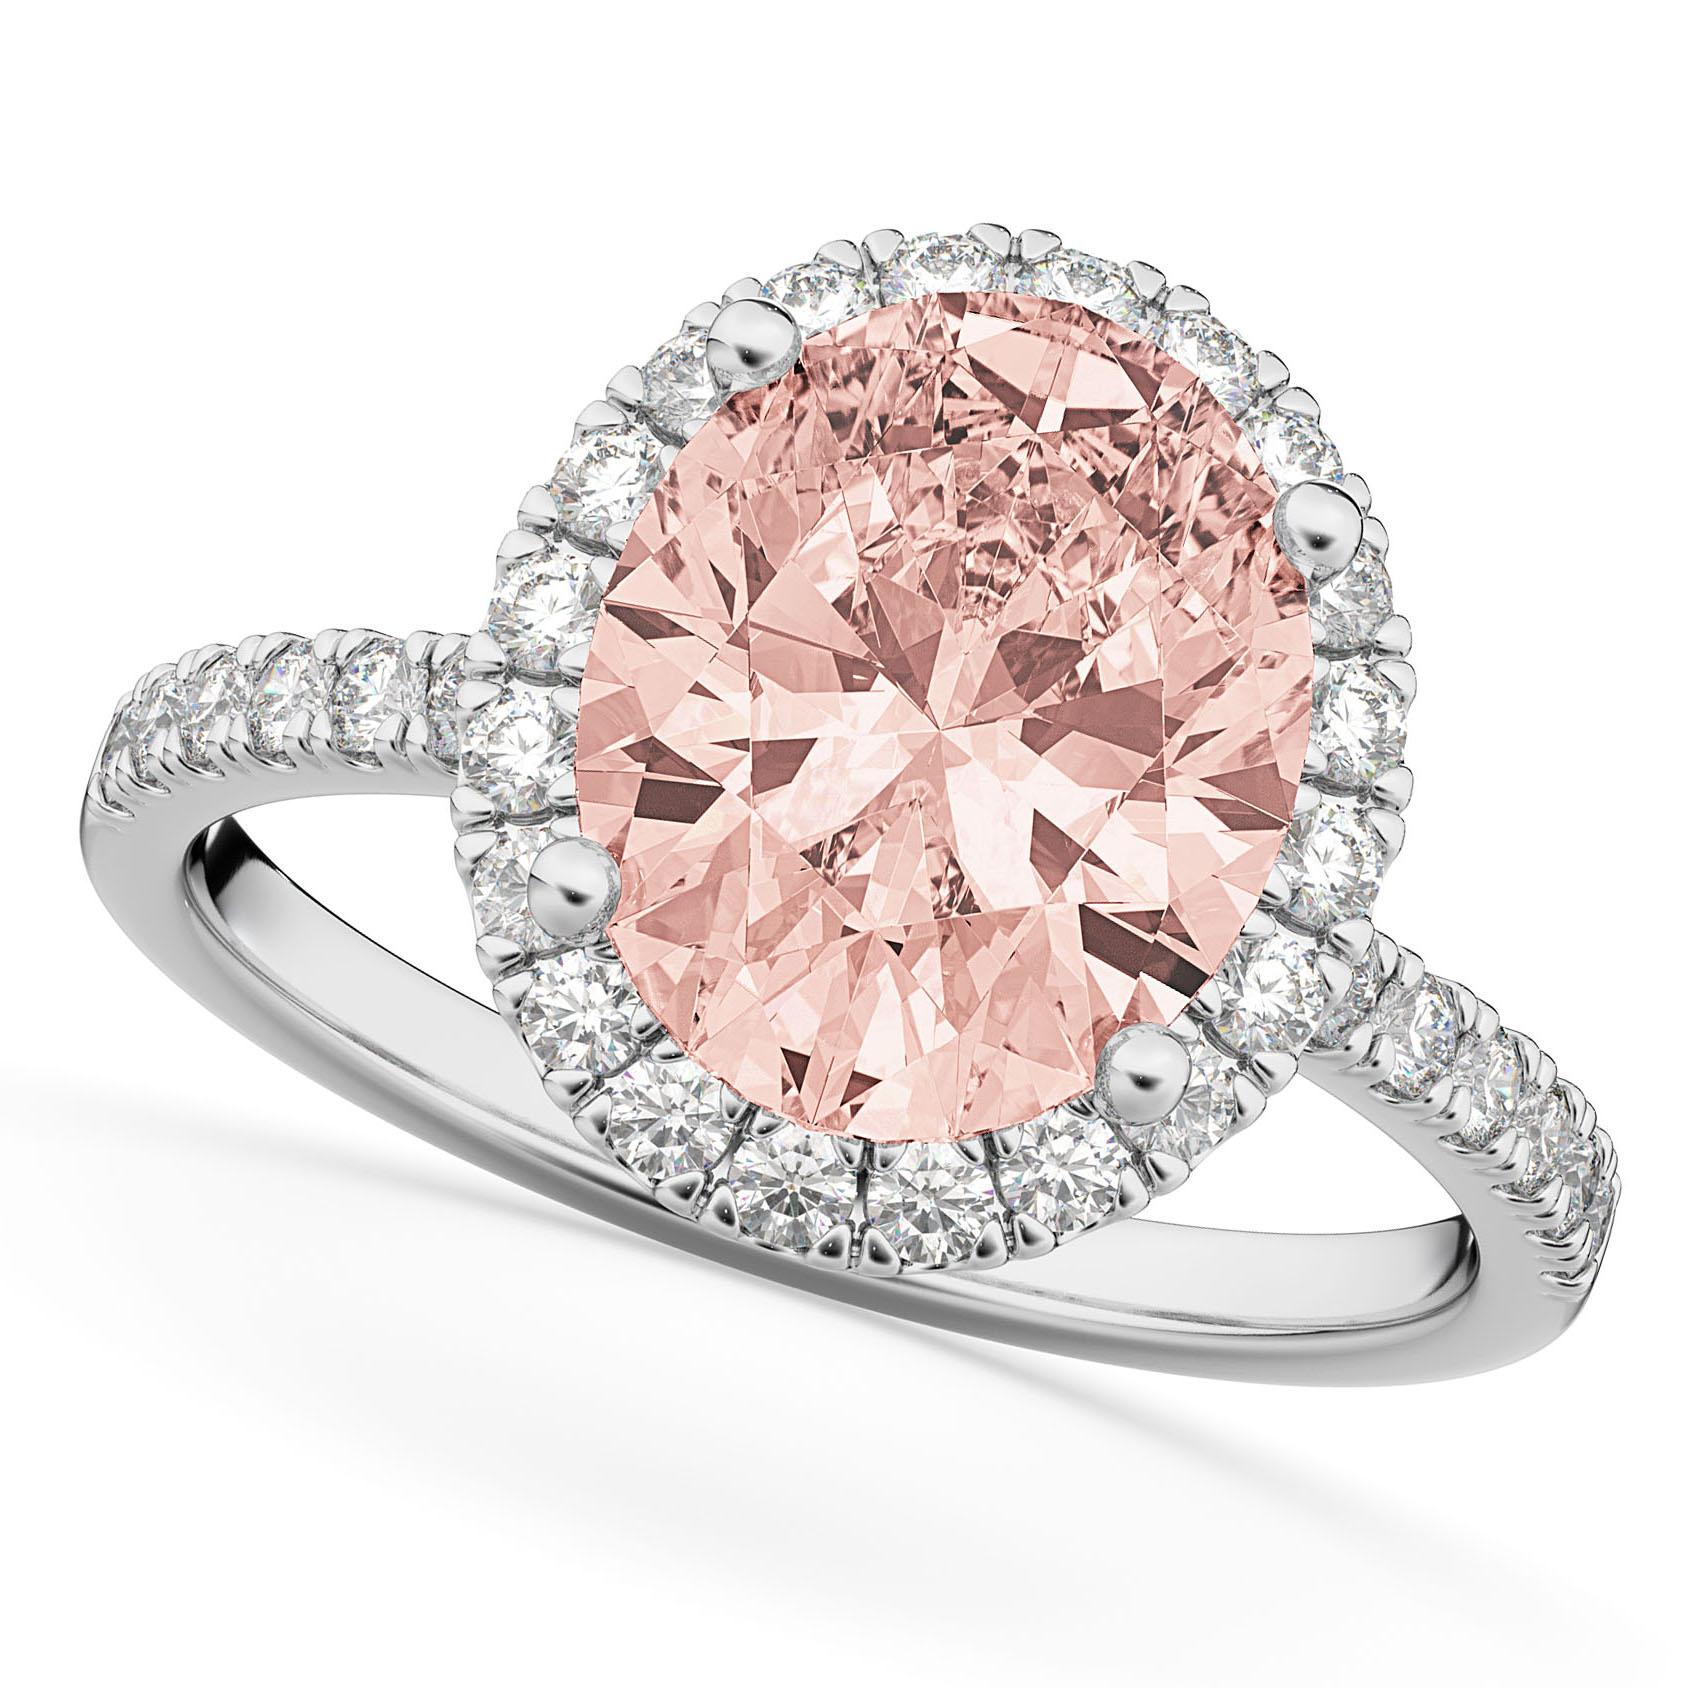 Oval Cut Halo Morganite Amp Diamond Engagement Ring 14k